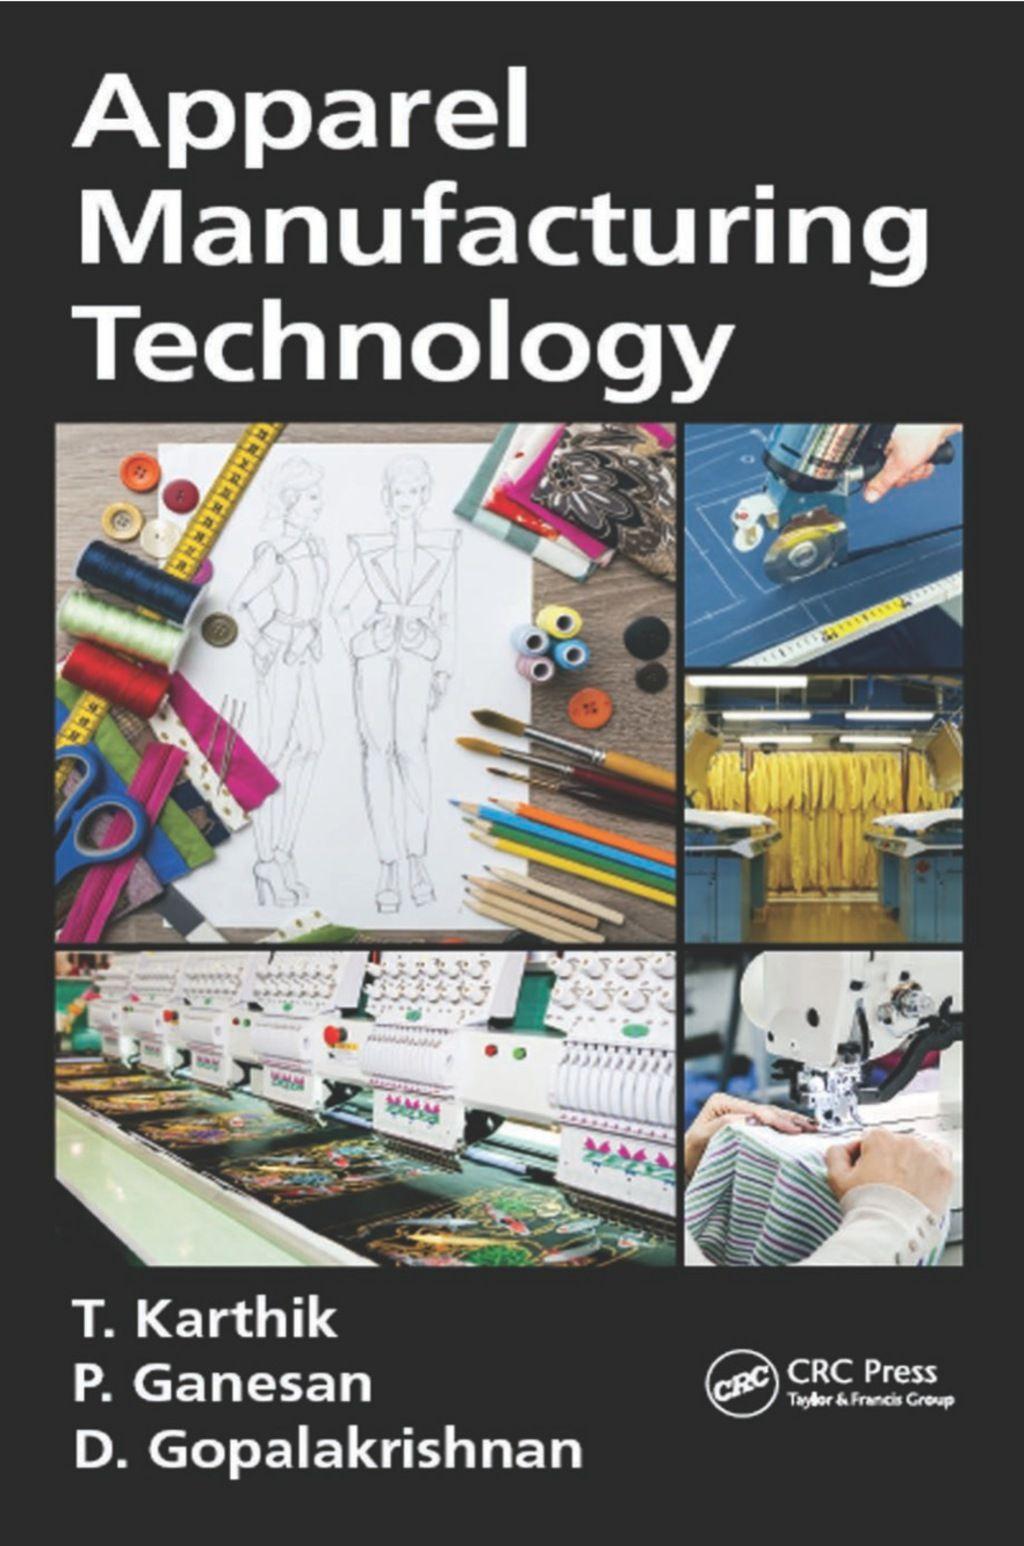 Apparel Manufacturing Technology (eBook Rental